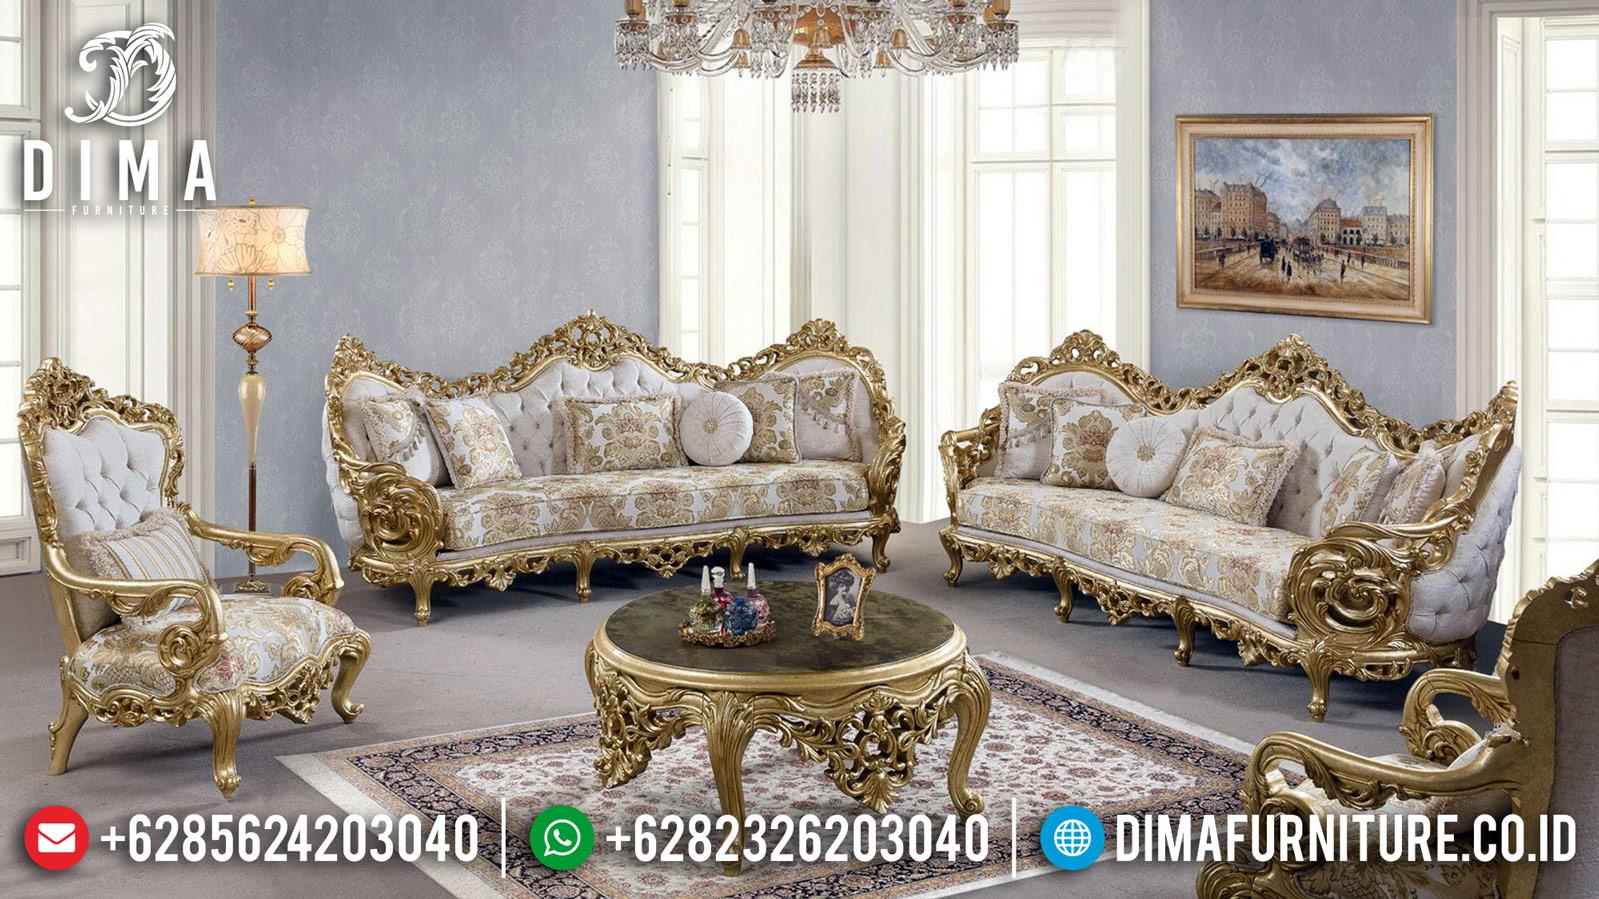 Luxury Sofa Set Kursi Ruang Tamu Ukiran Mewah Jepara New Gold DF-1217